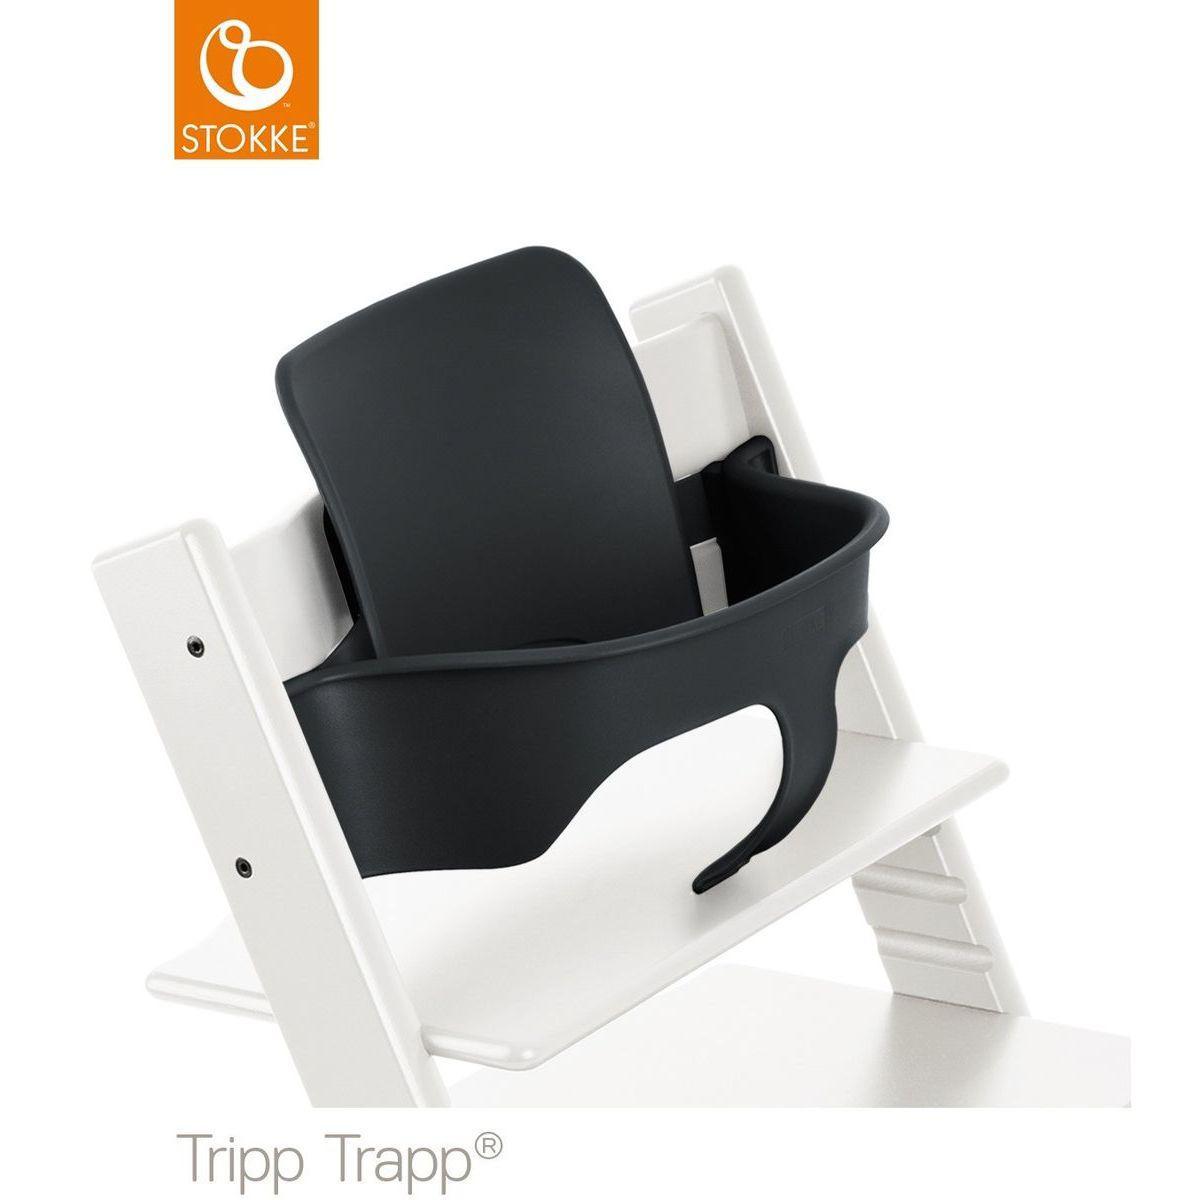 Baby set chaise haute TRIPP TRAPP Stokke noir